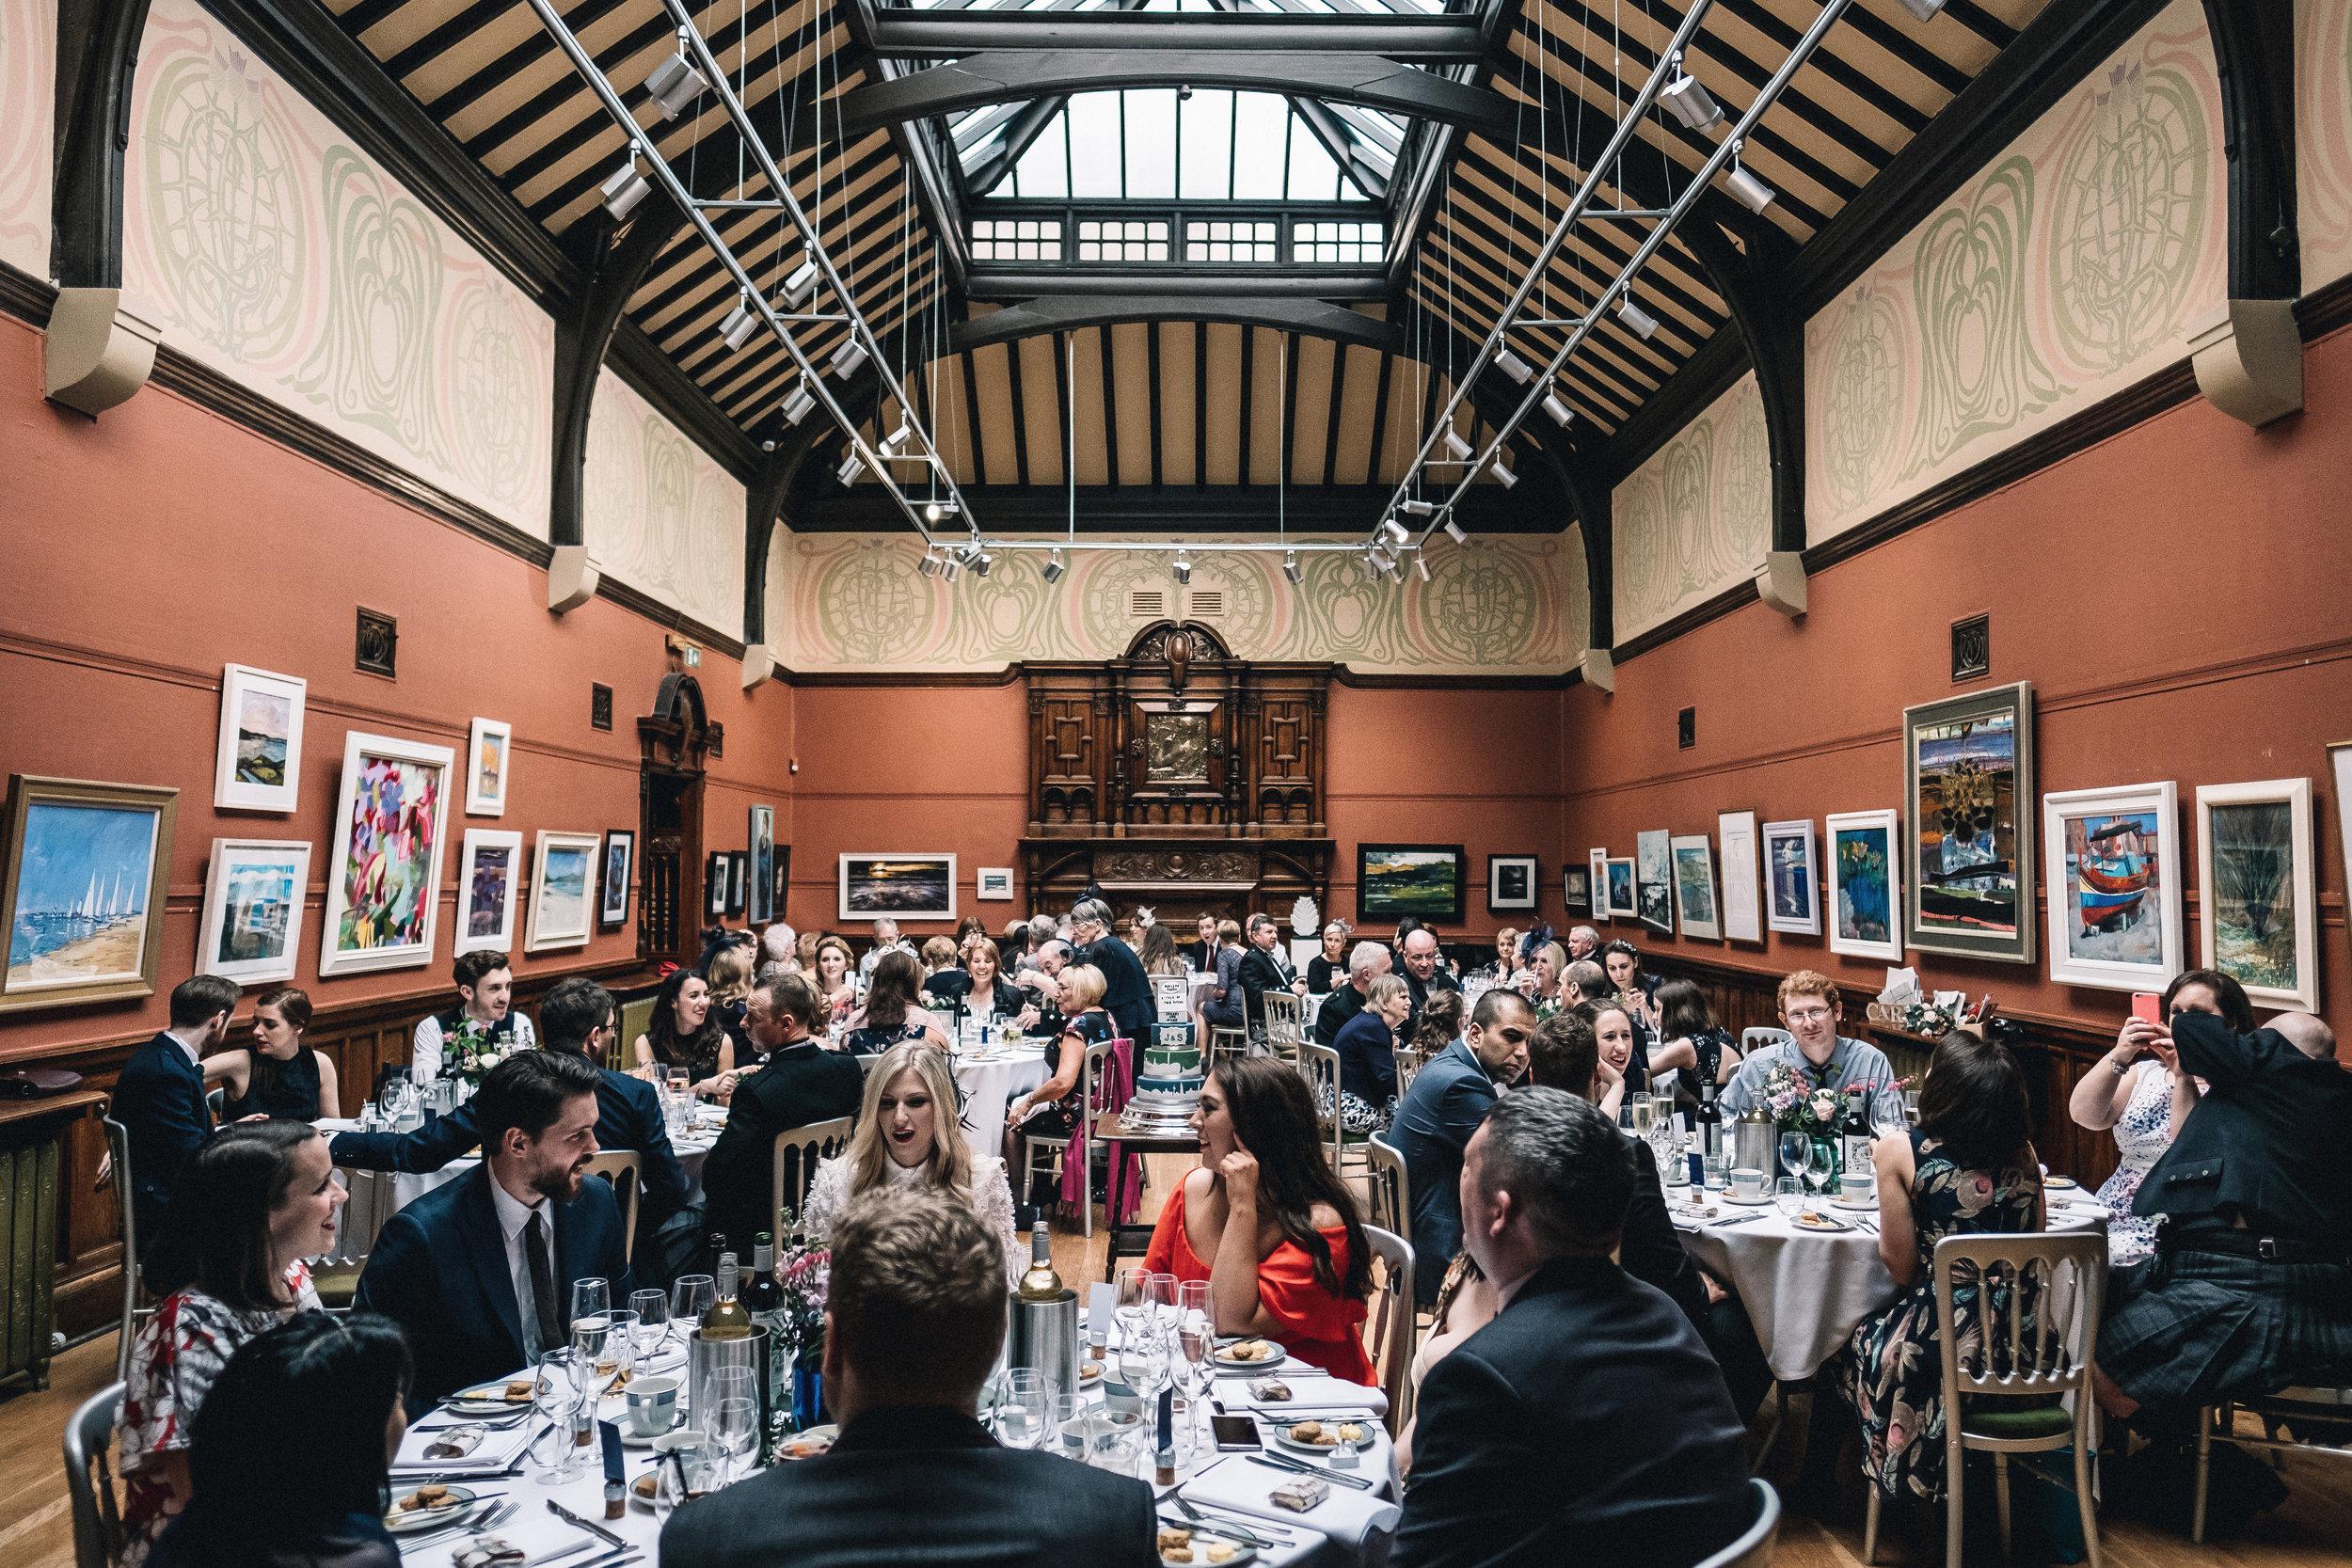 Gallery of the Glasgow Art Club